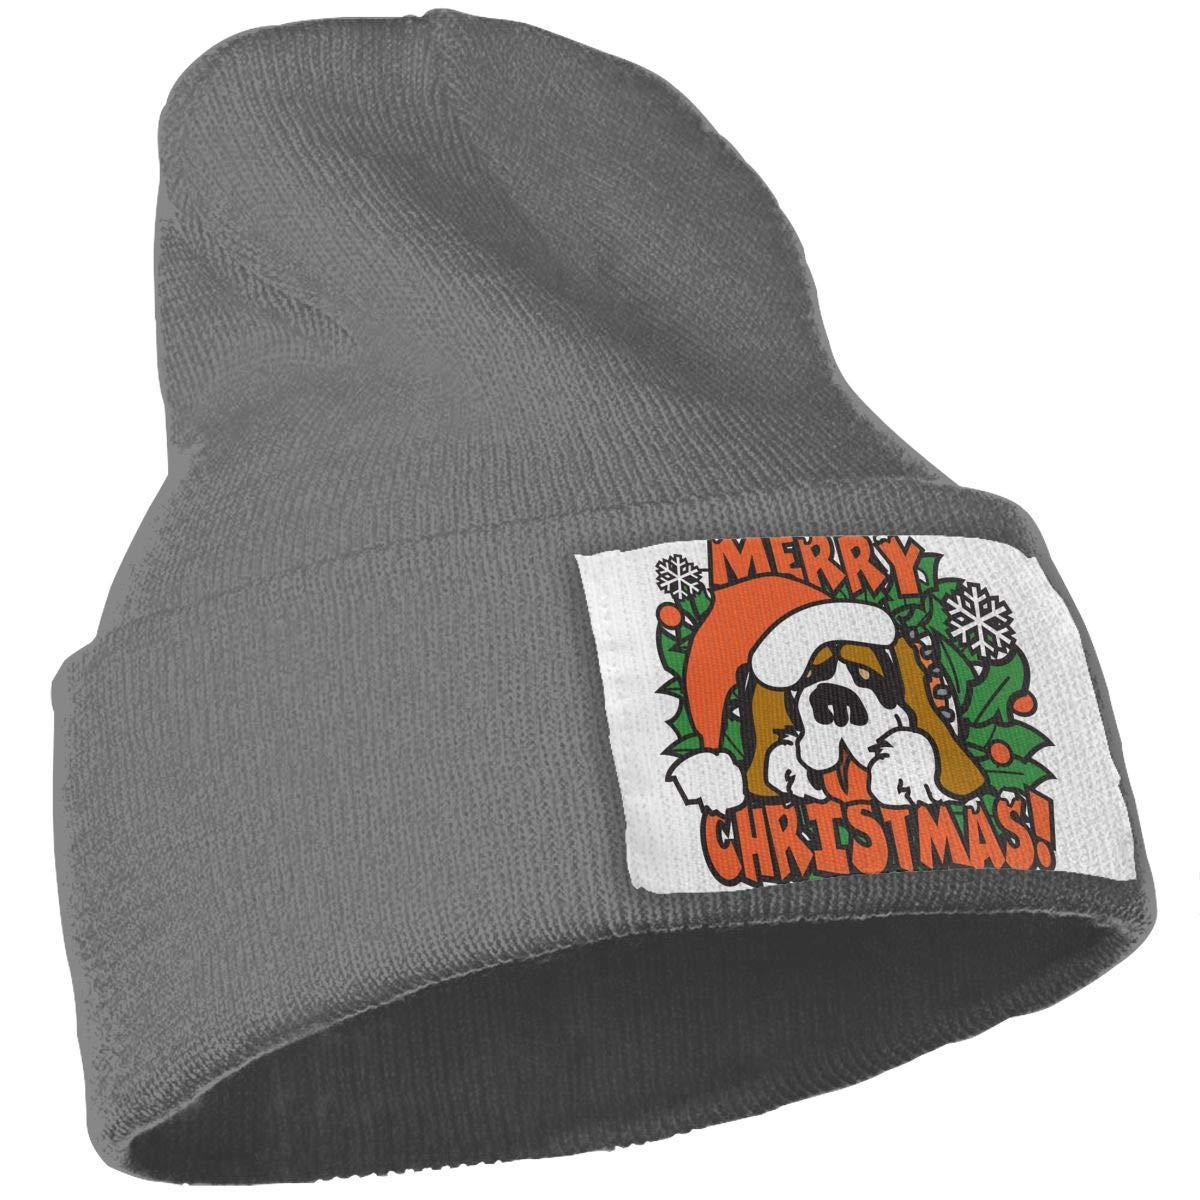 Christmas Dog Cuffed Plain Baggy Winter Skull Knit Hat Cap Slouchy Beanie Hat for Men /& Women Stylish